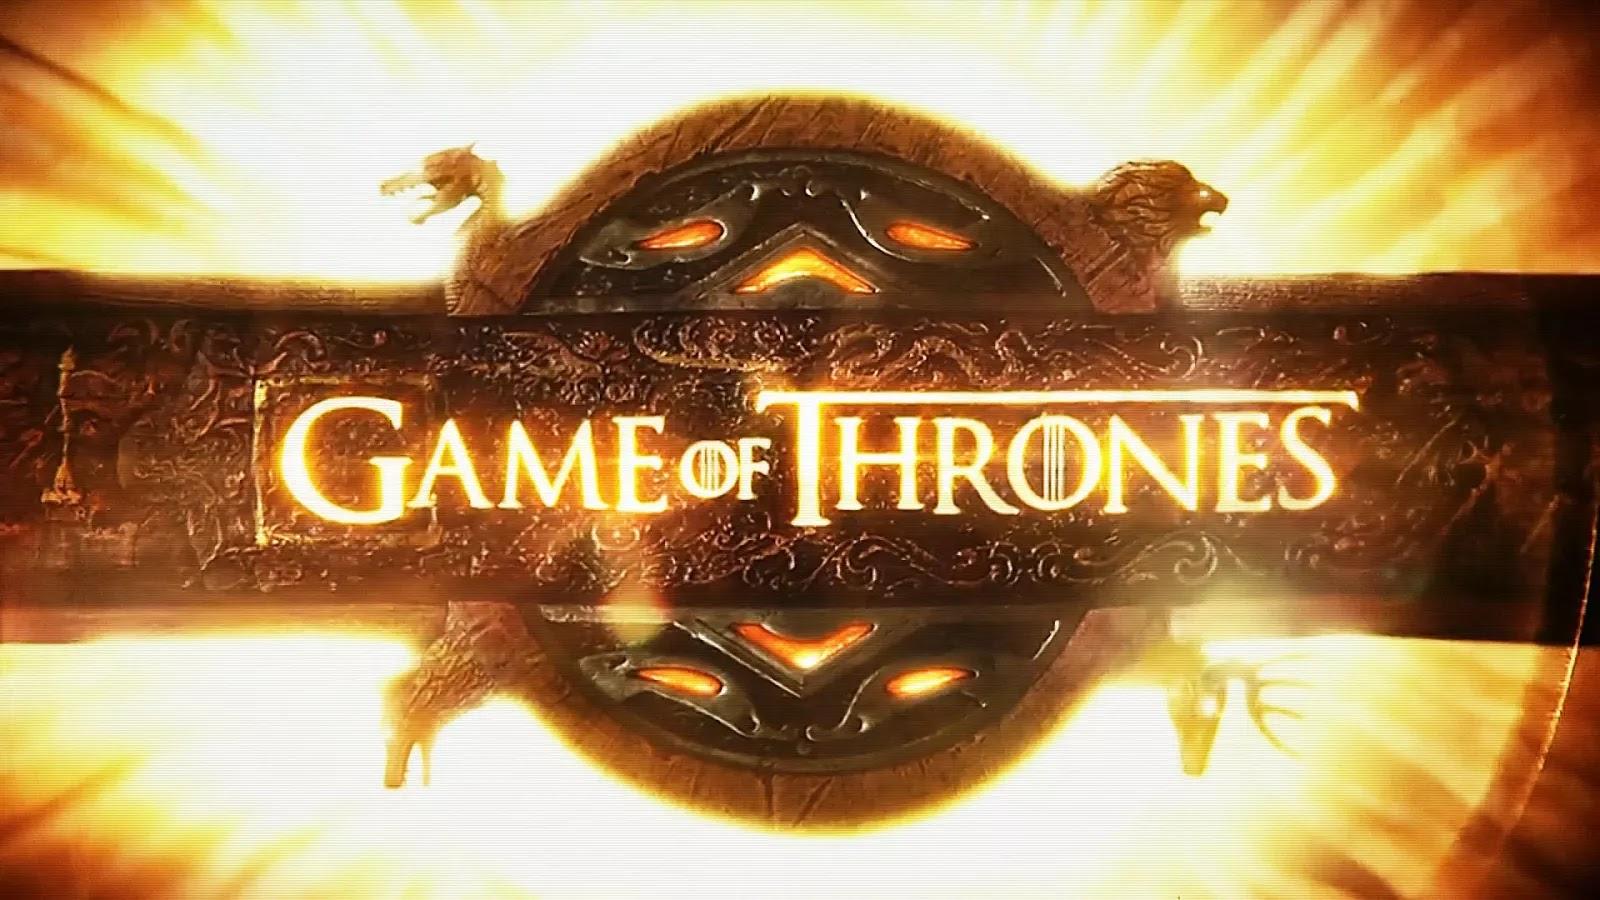 game of thrones season 3 torrent magnet